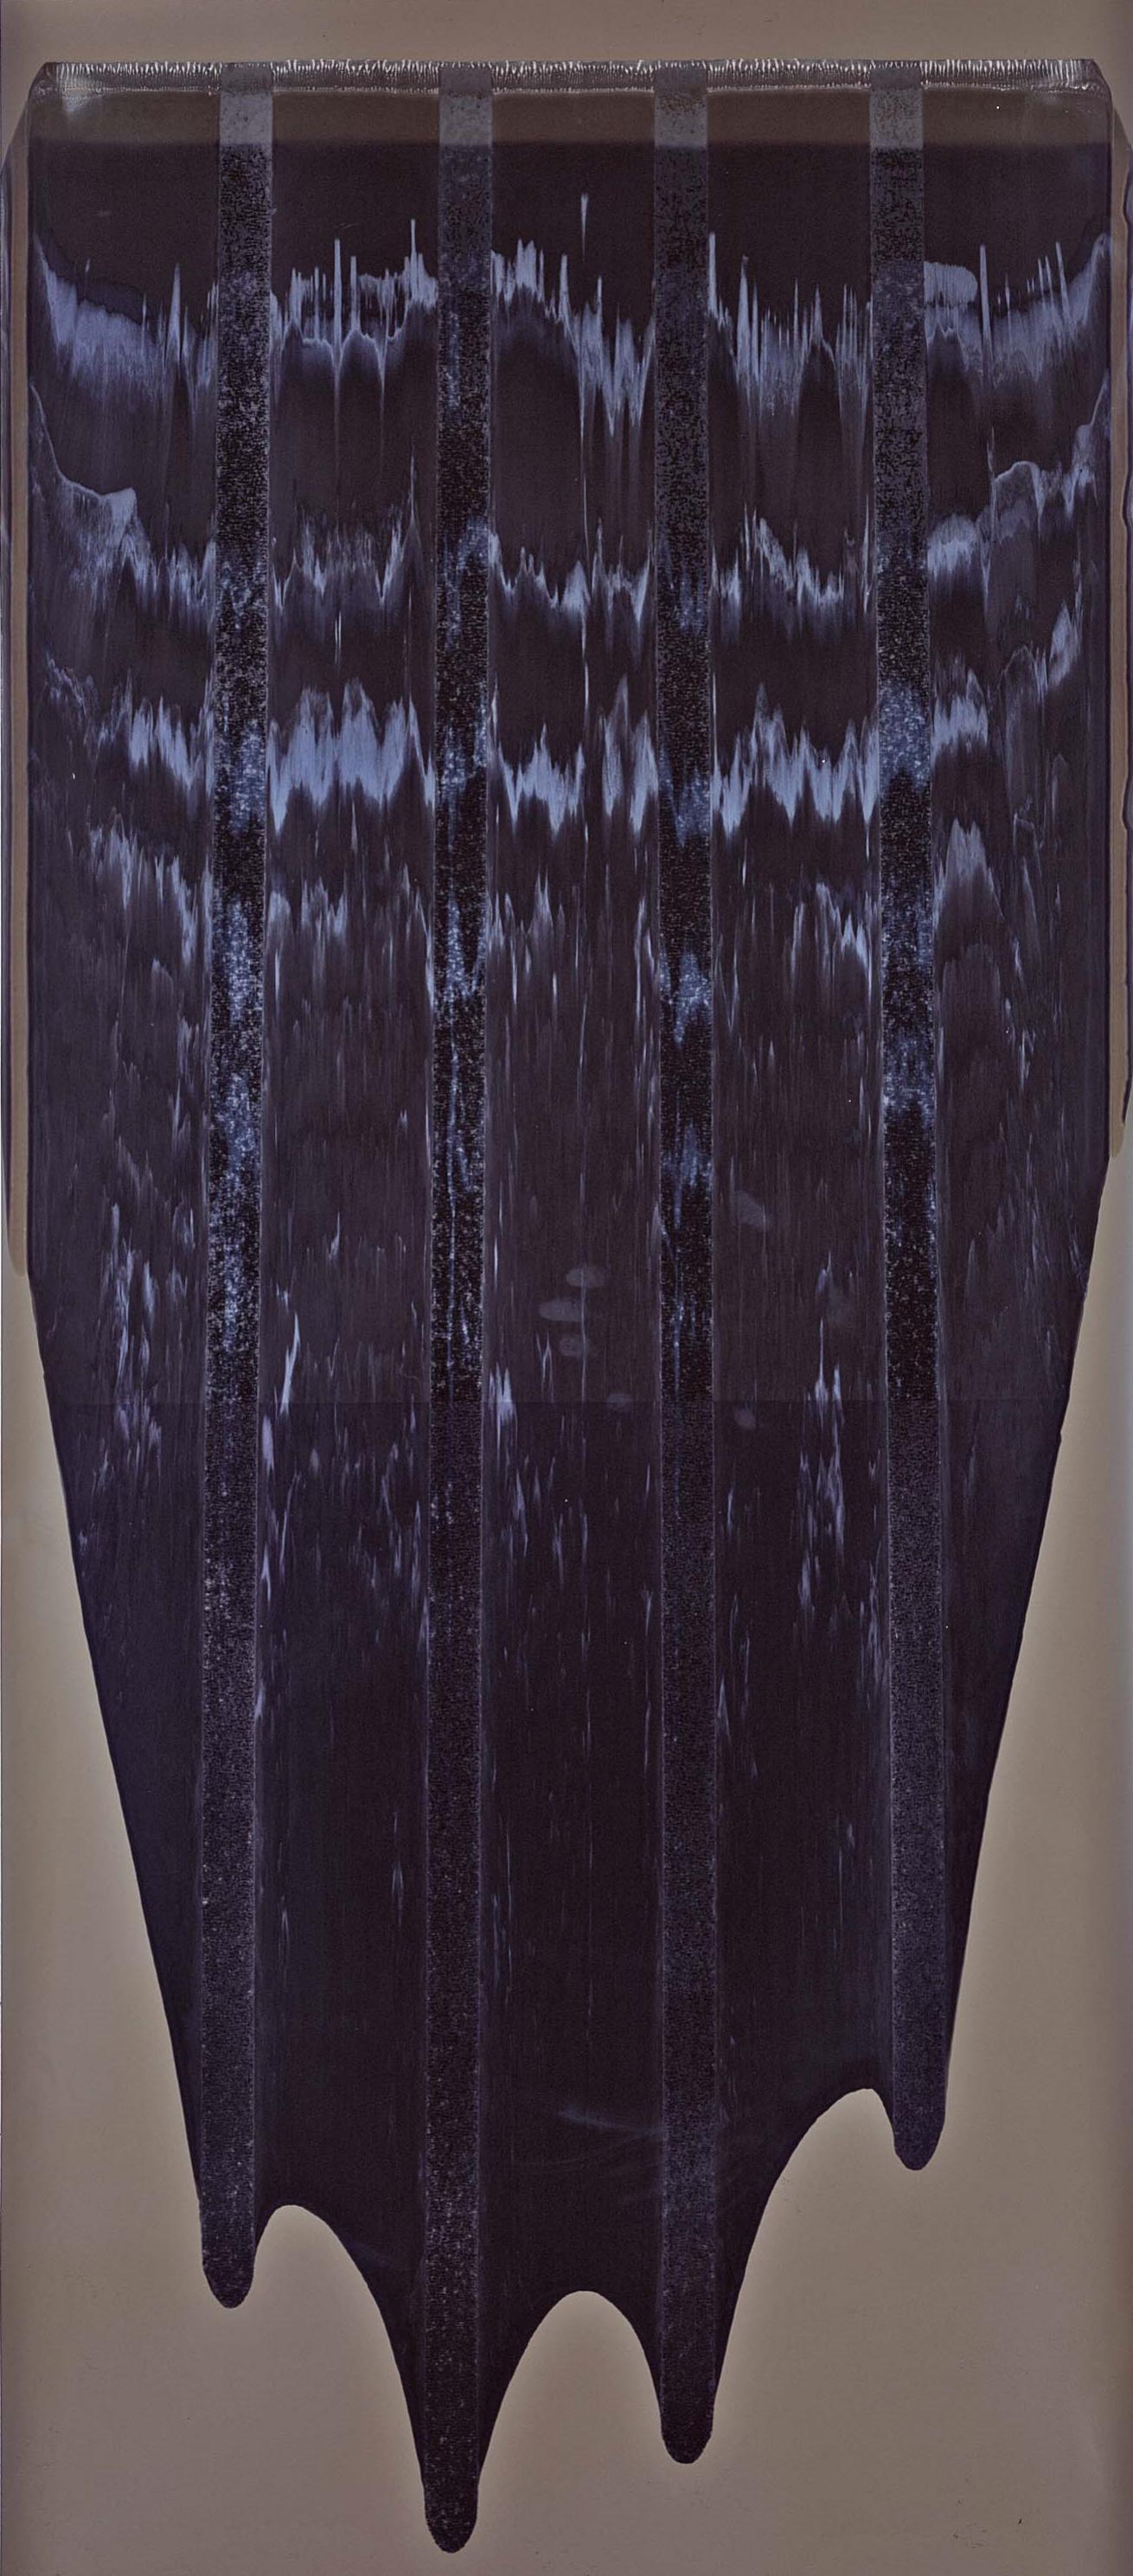 Ellen Carey, Pull, Ellen Carey Photography, Art, Matrix #153, Wadsworth Atheneum Museum of Art